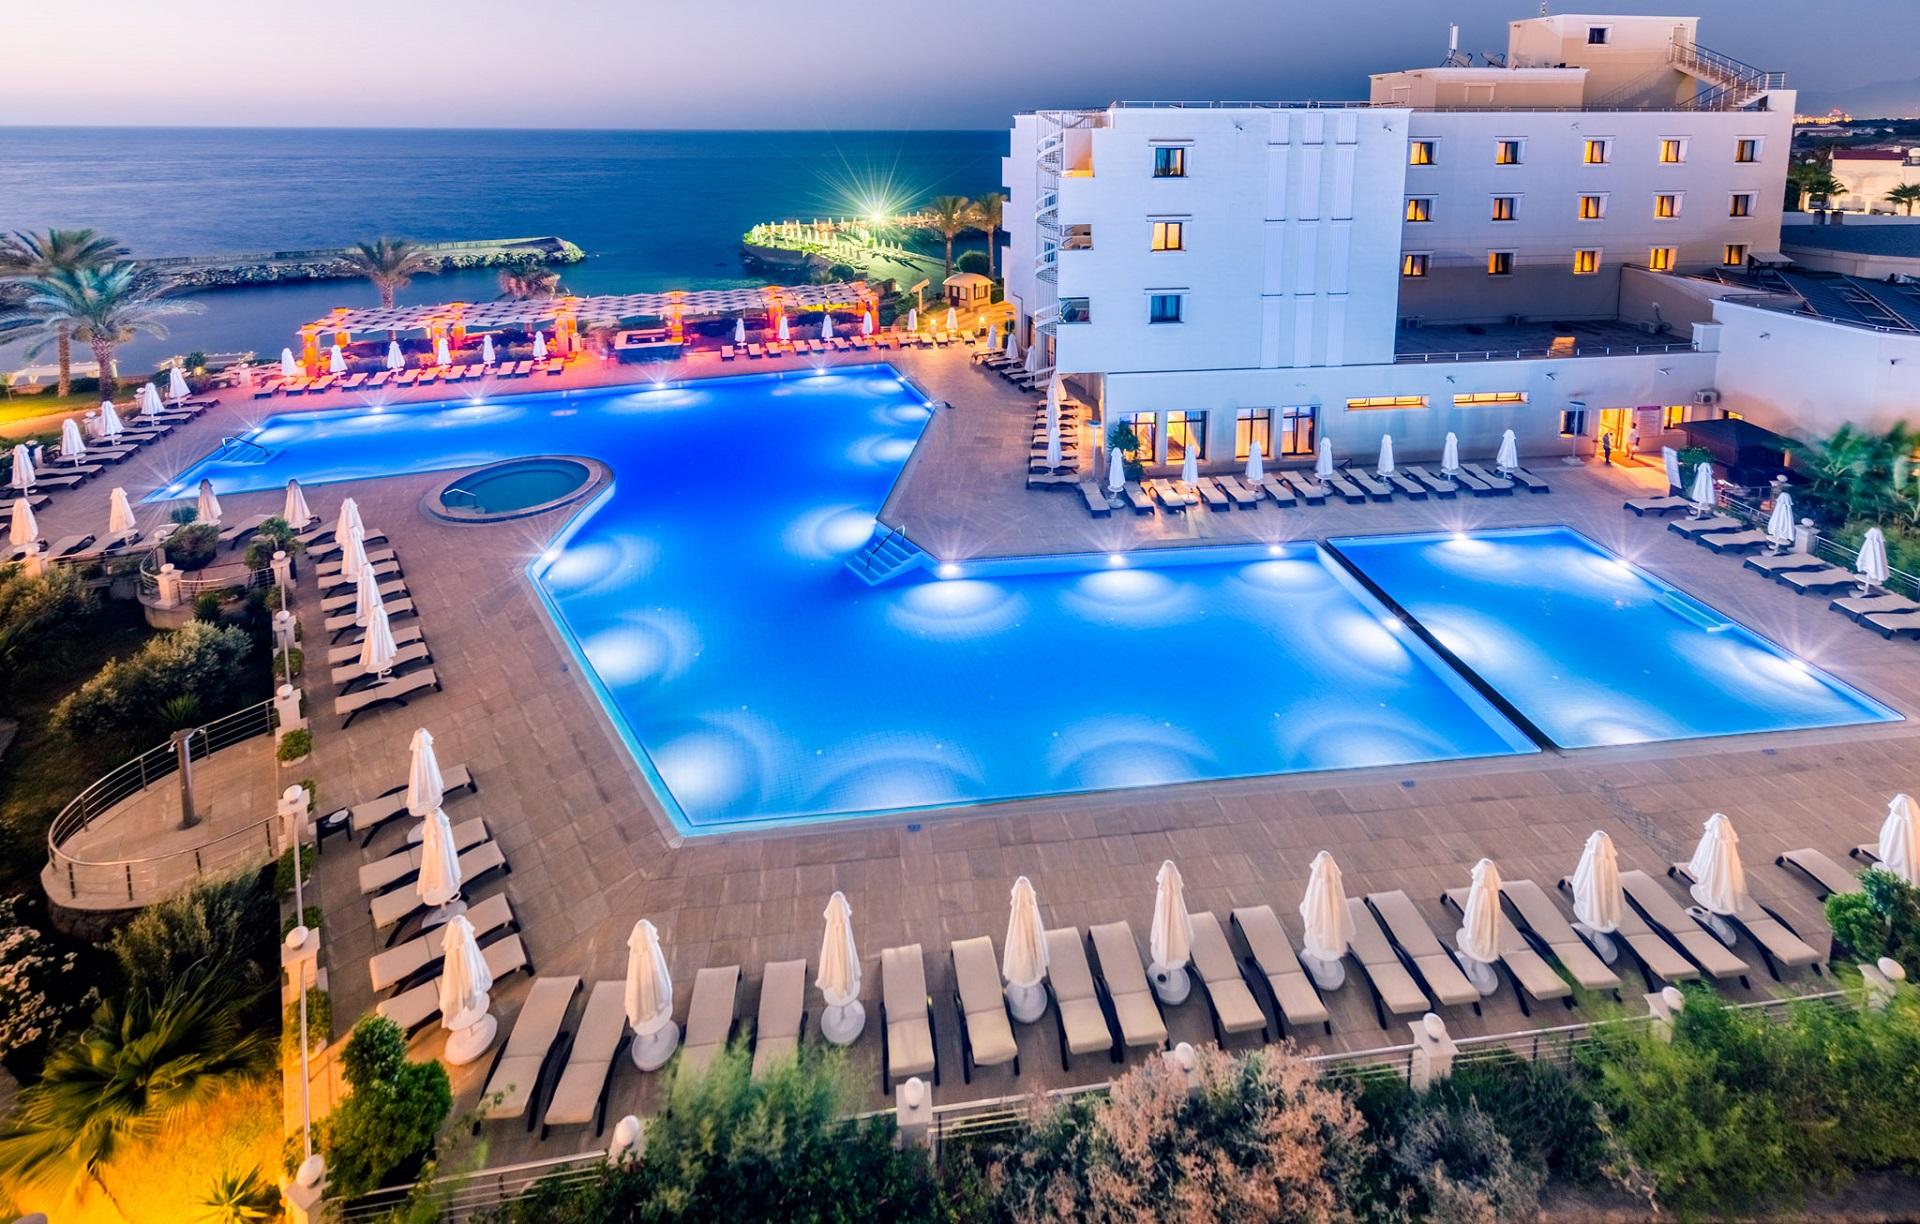 http://www.budavartours.hu/binaries//content/gallery/budavar/locations/accomodations/Ciprus/Kyrenia/Vuni+Palace+Hotel+%26+Casino/vuni-palace-hotel-kyrenia-ciprus3.jpg